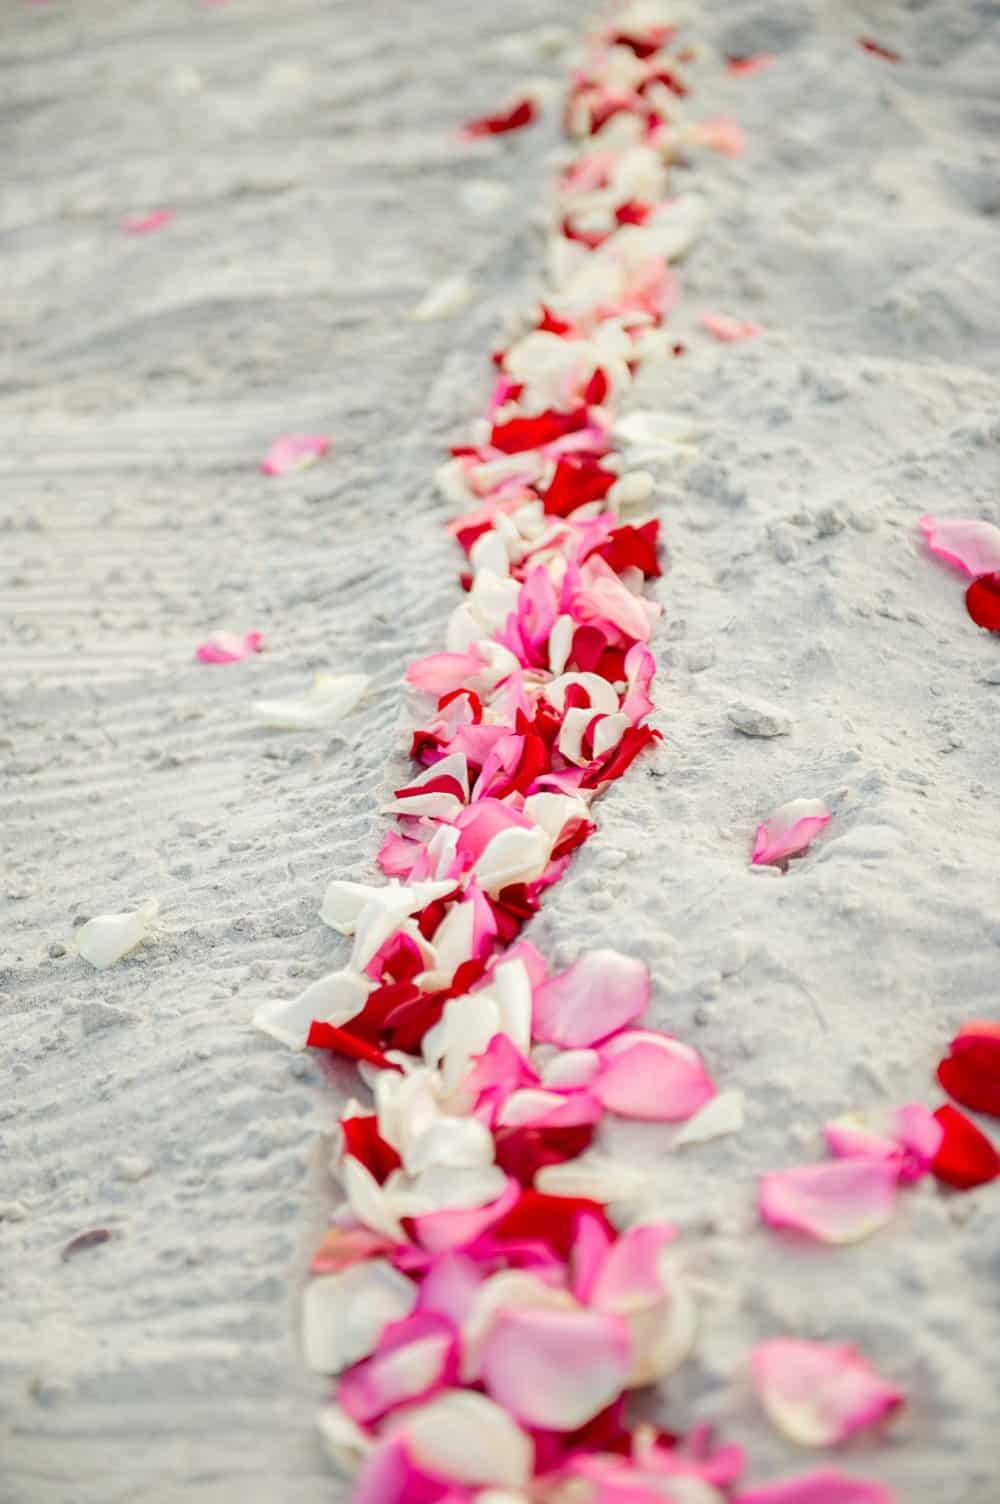 Florida Destination Wedding on the Beach | The Budget Savvy Bride